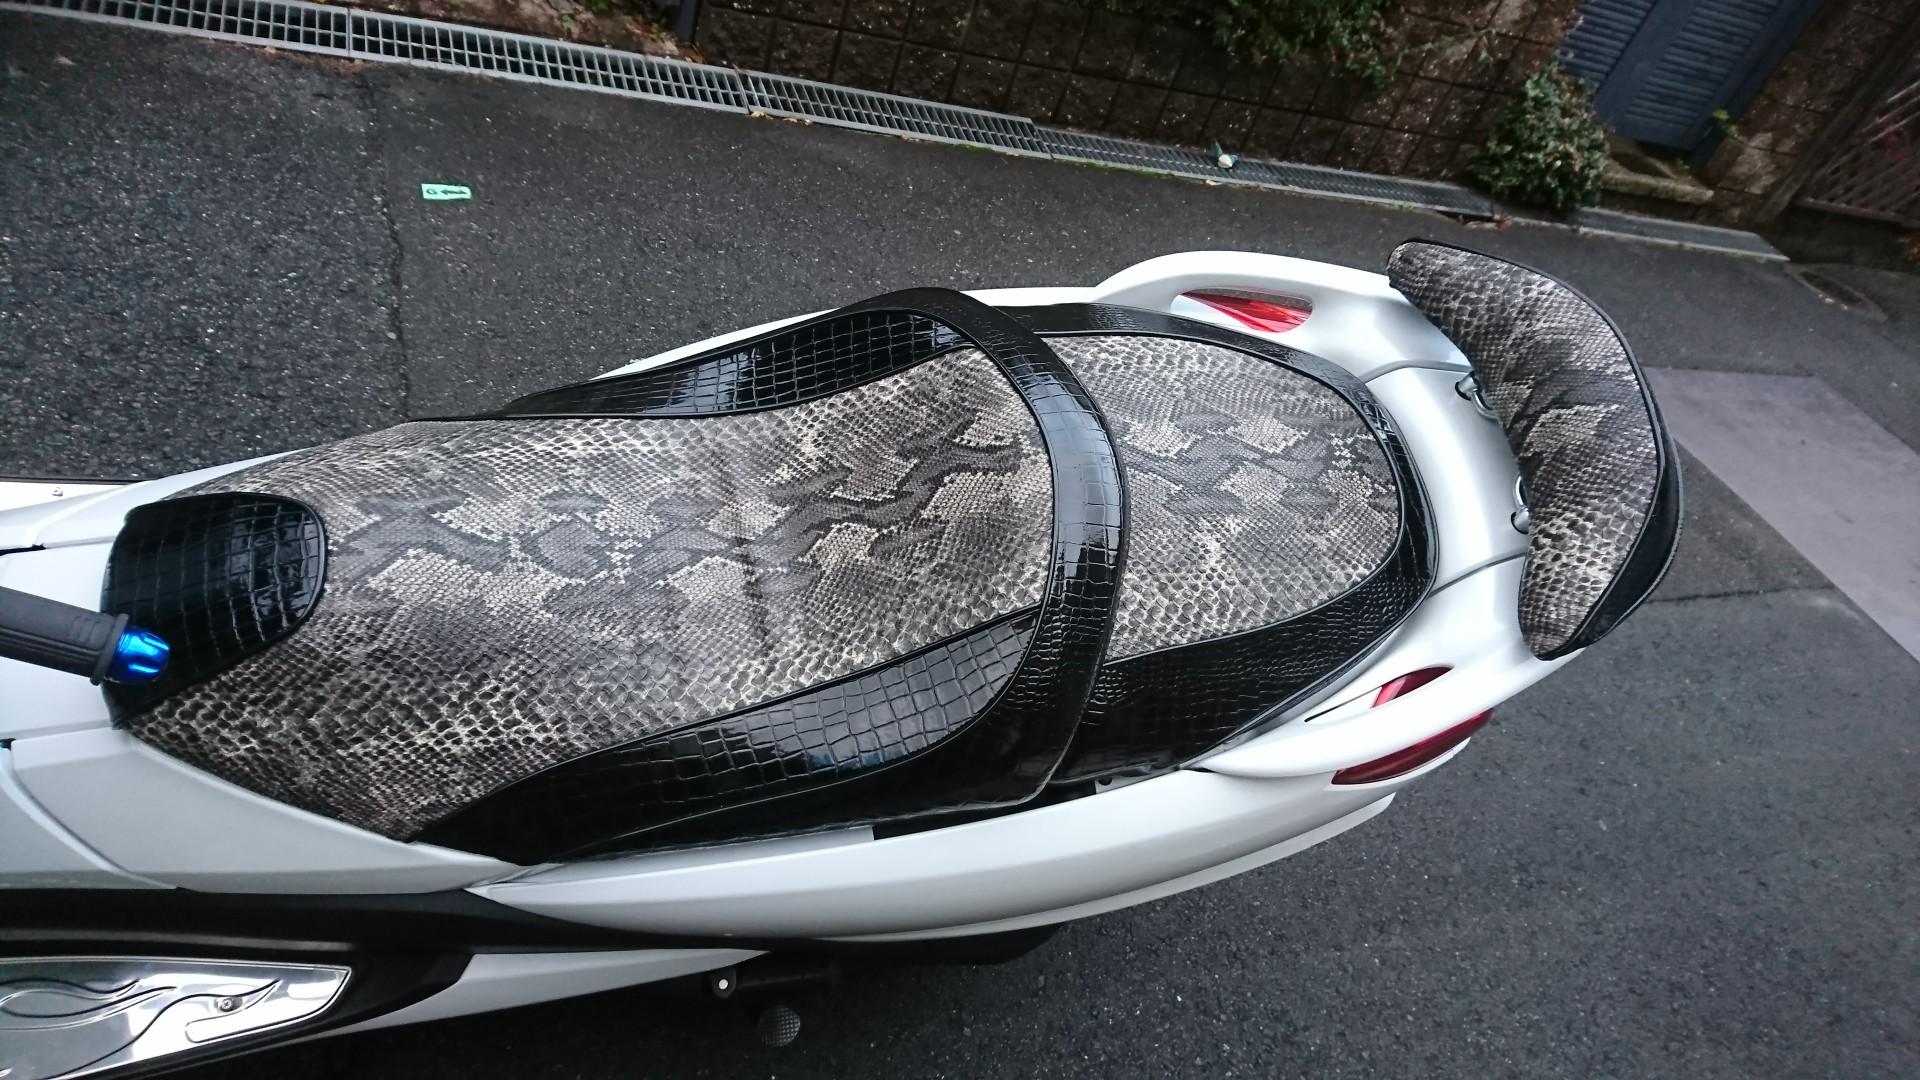 http://customseat.jp/first_website/customblog/DSC_0120.JPG